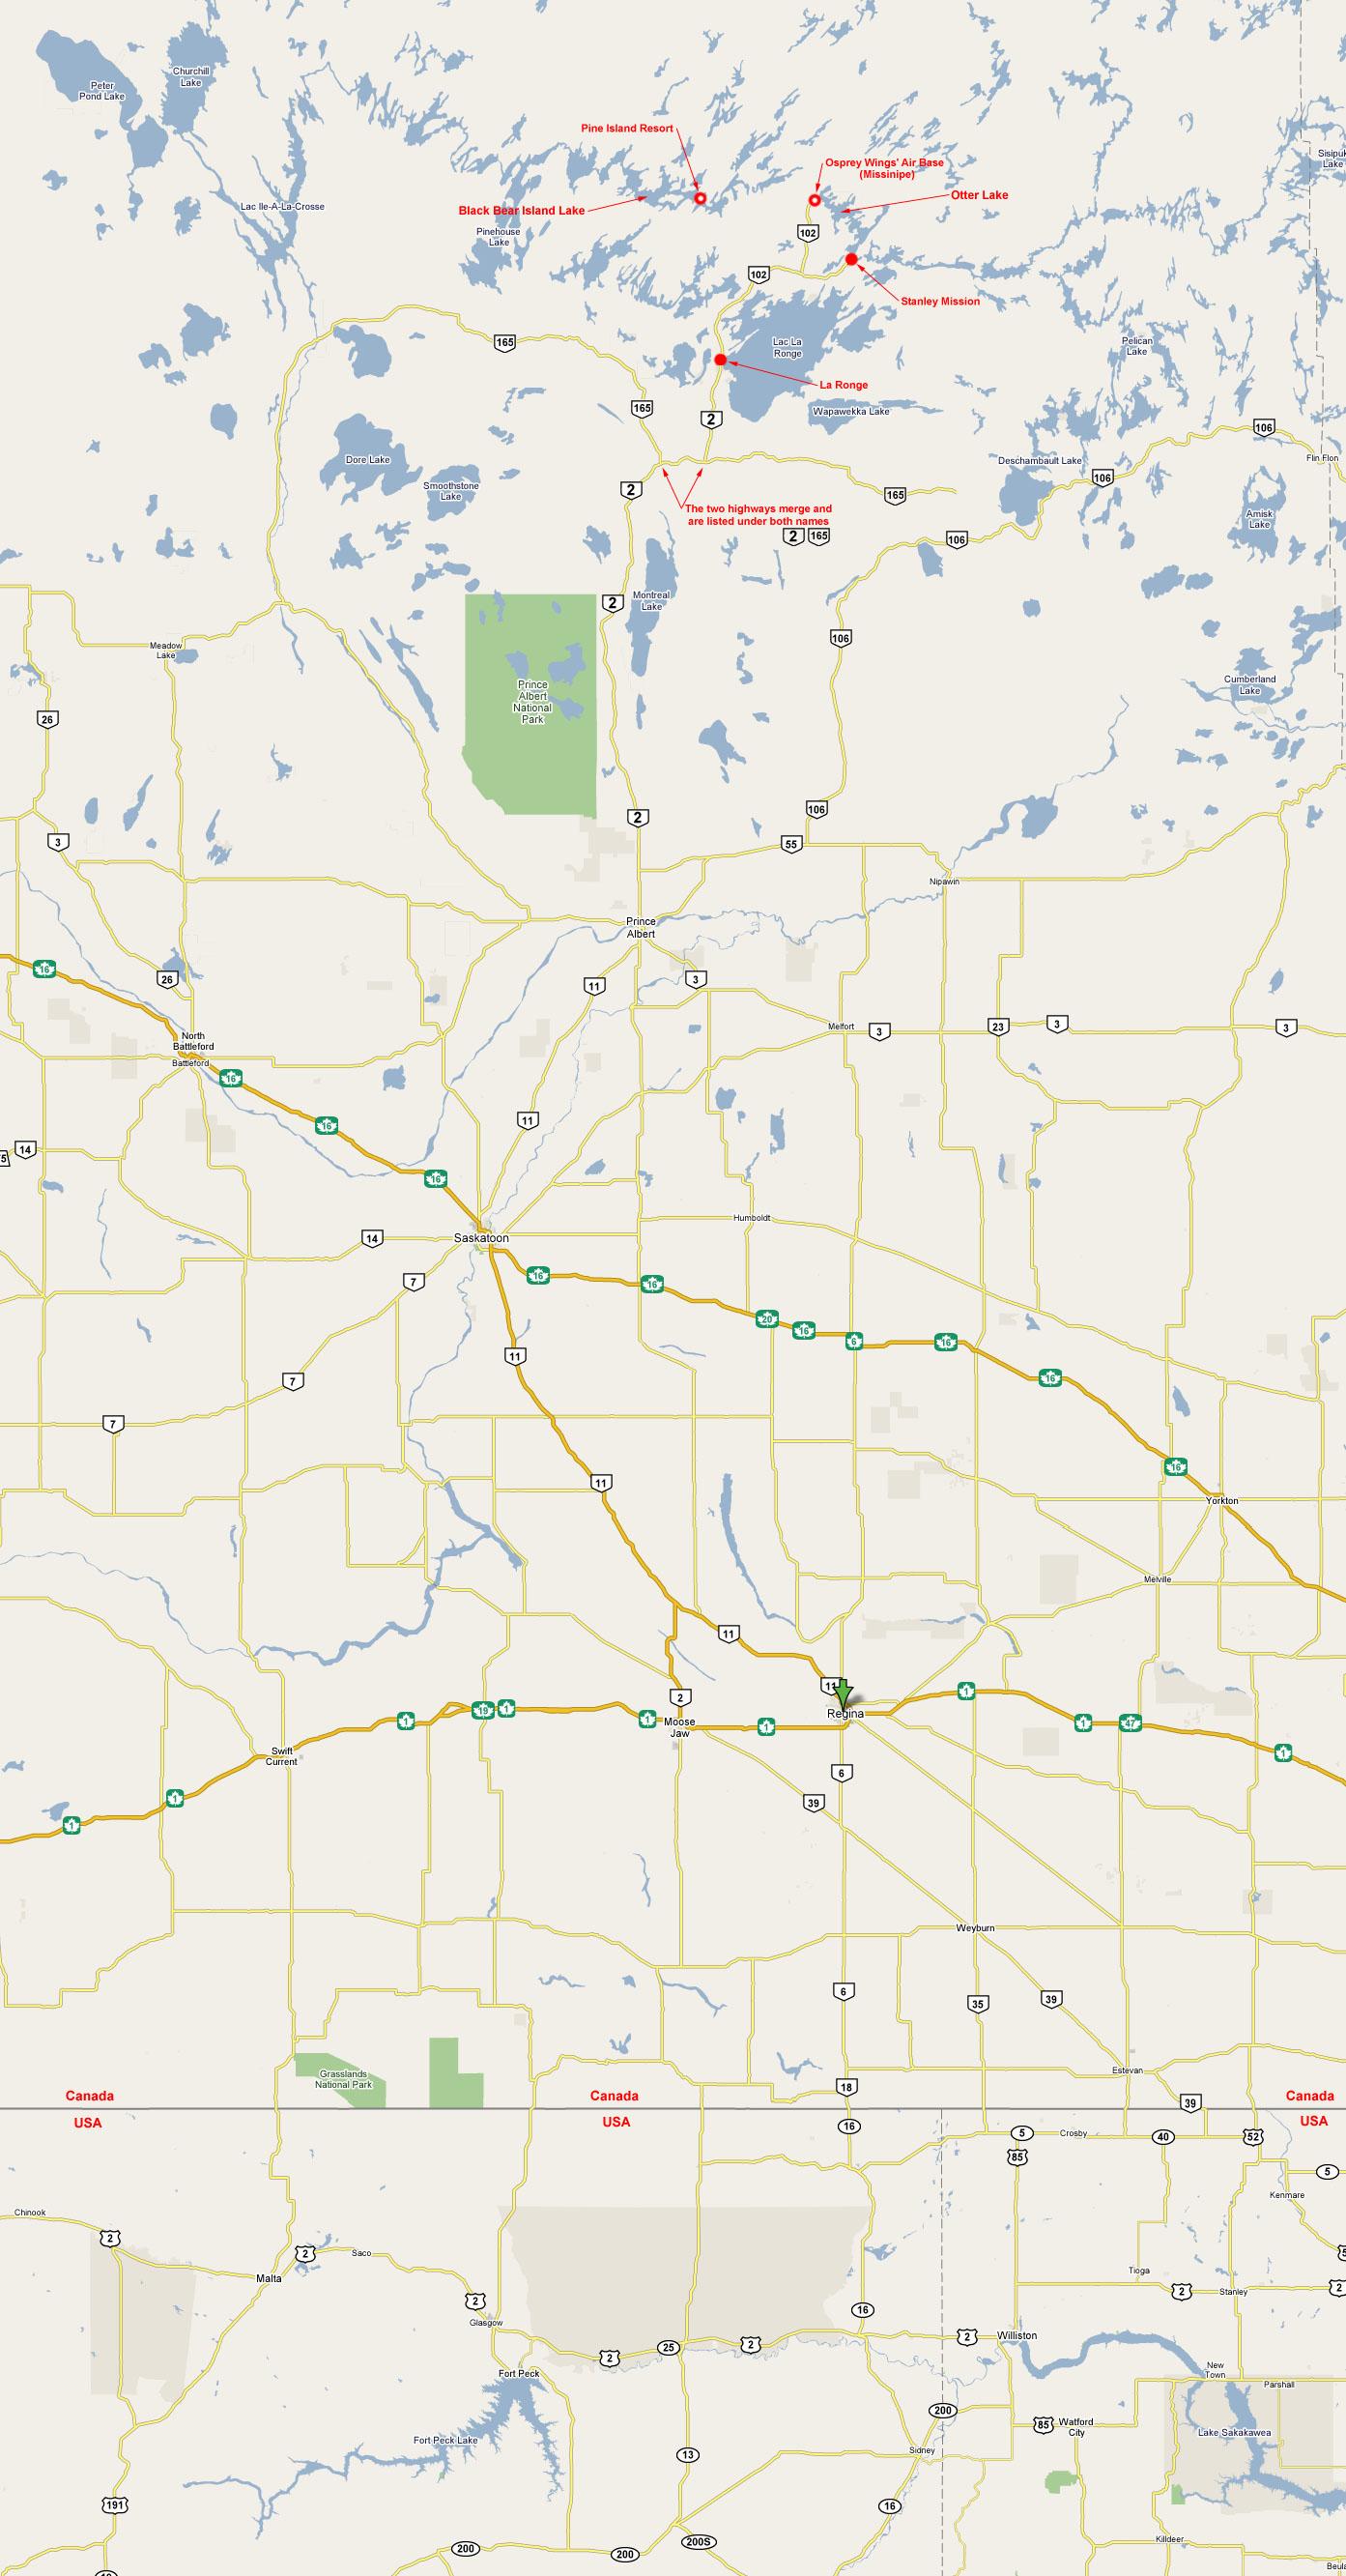 giant road map us border to missinipe 1393 x 2665 pixels 5 meg